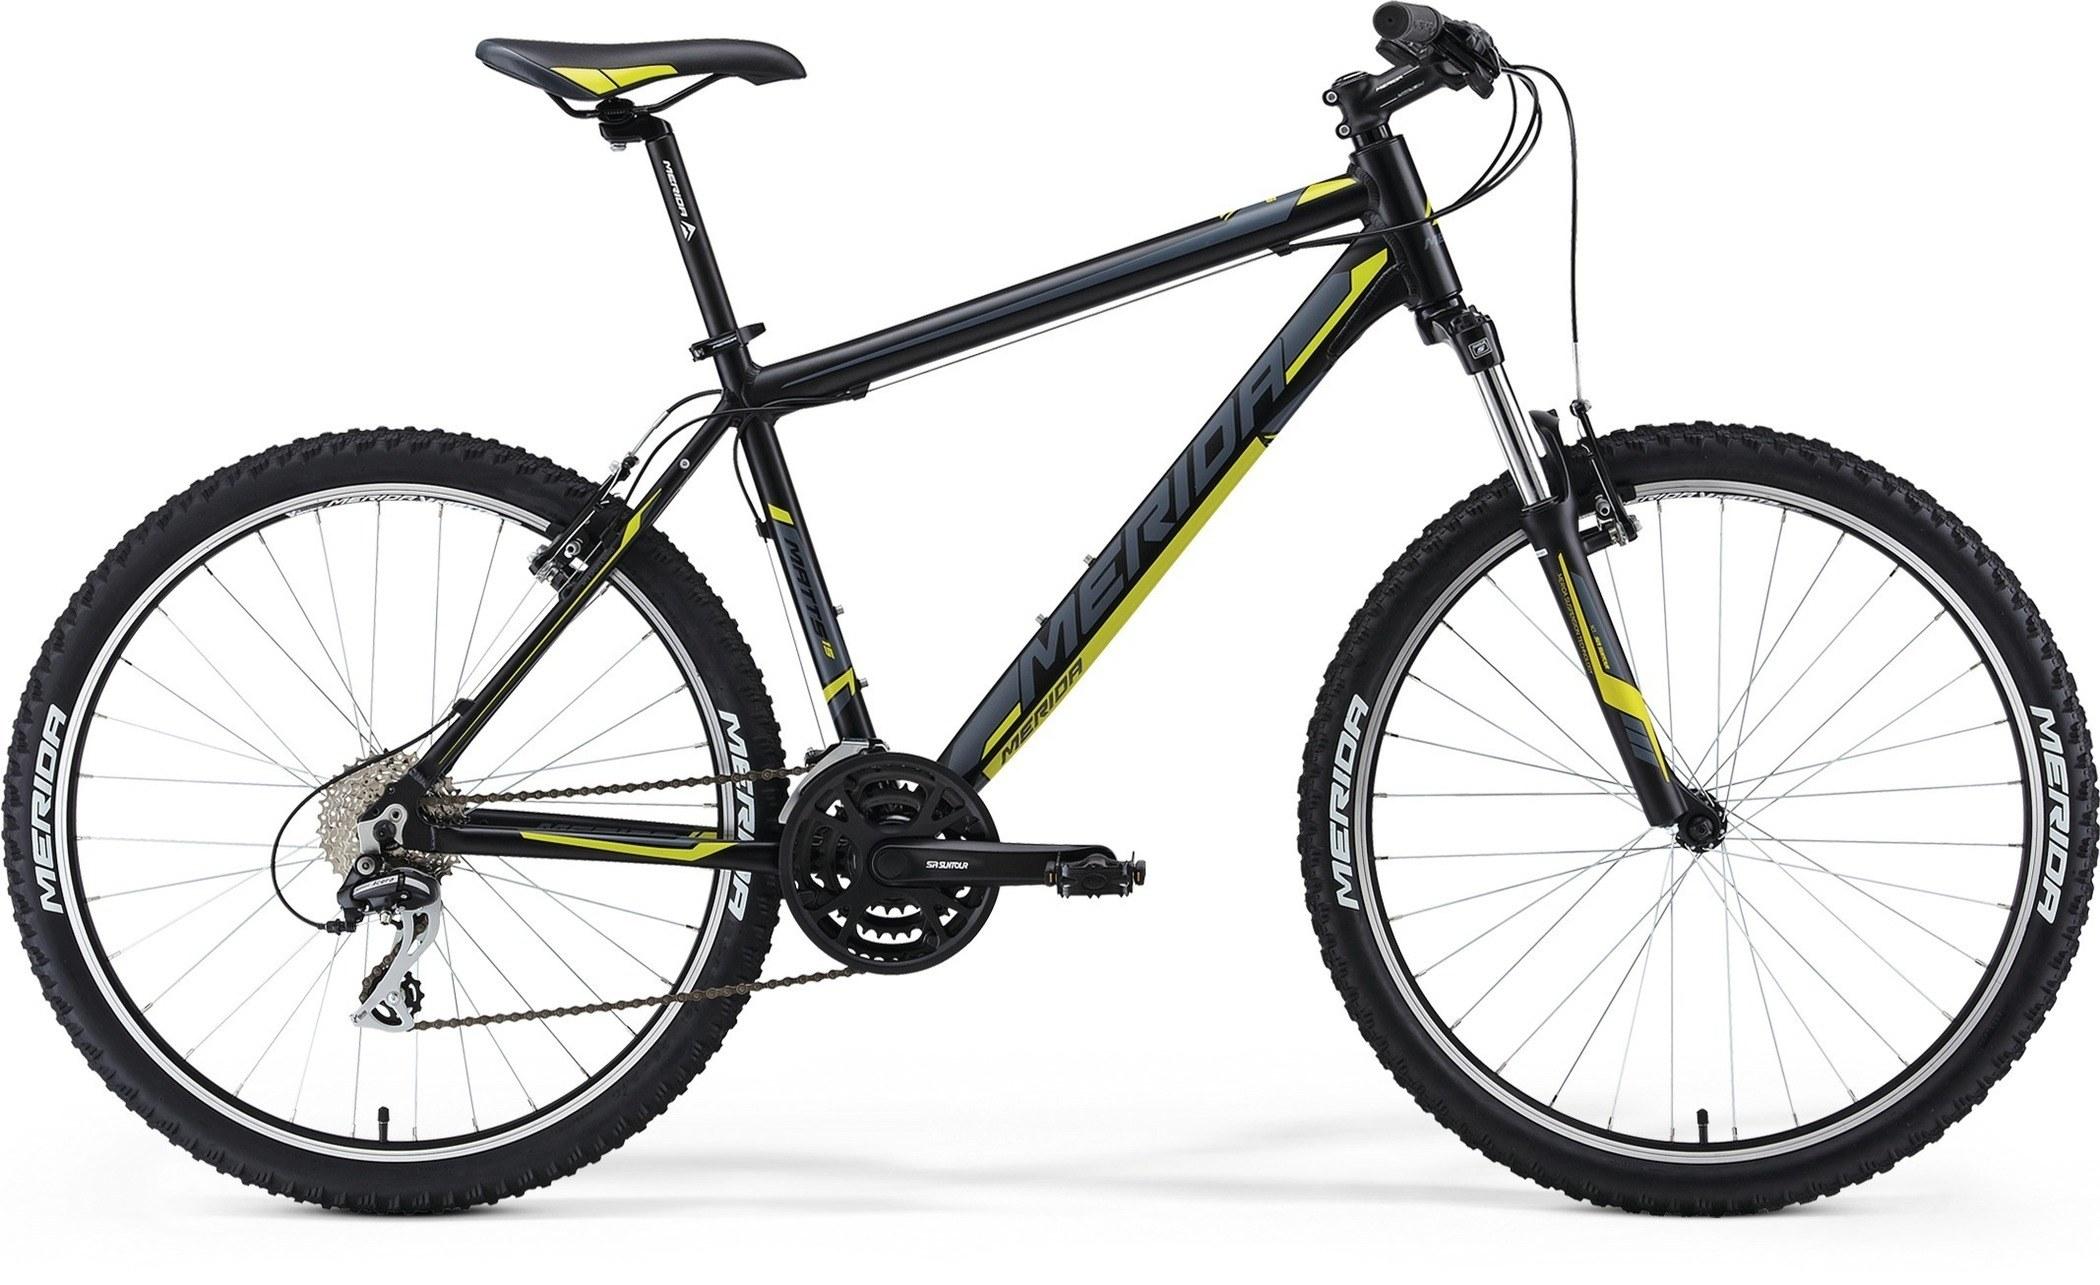 Merida Matts 15 купить велосипед Где купить дешевый велосипед image 17 07 14 13 39